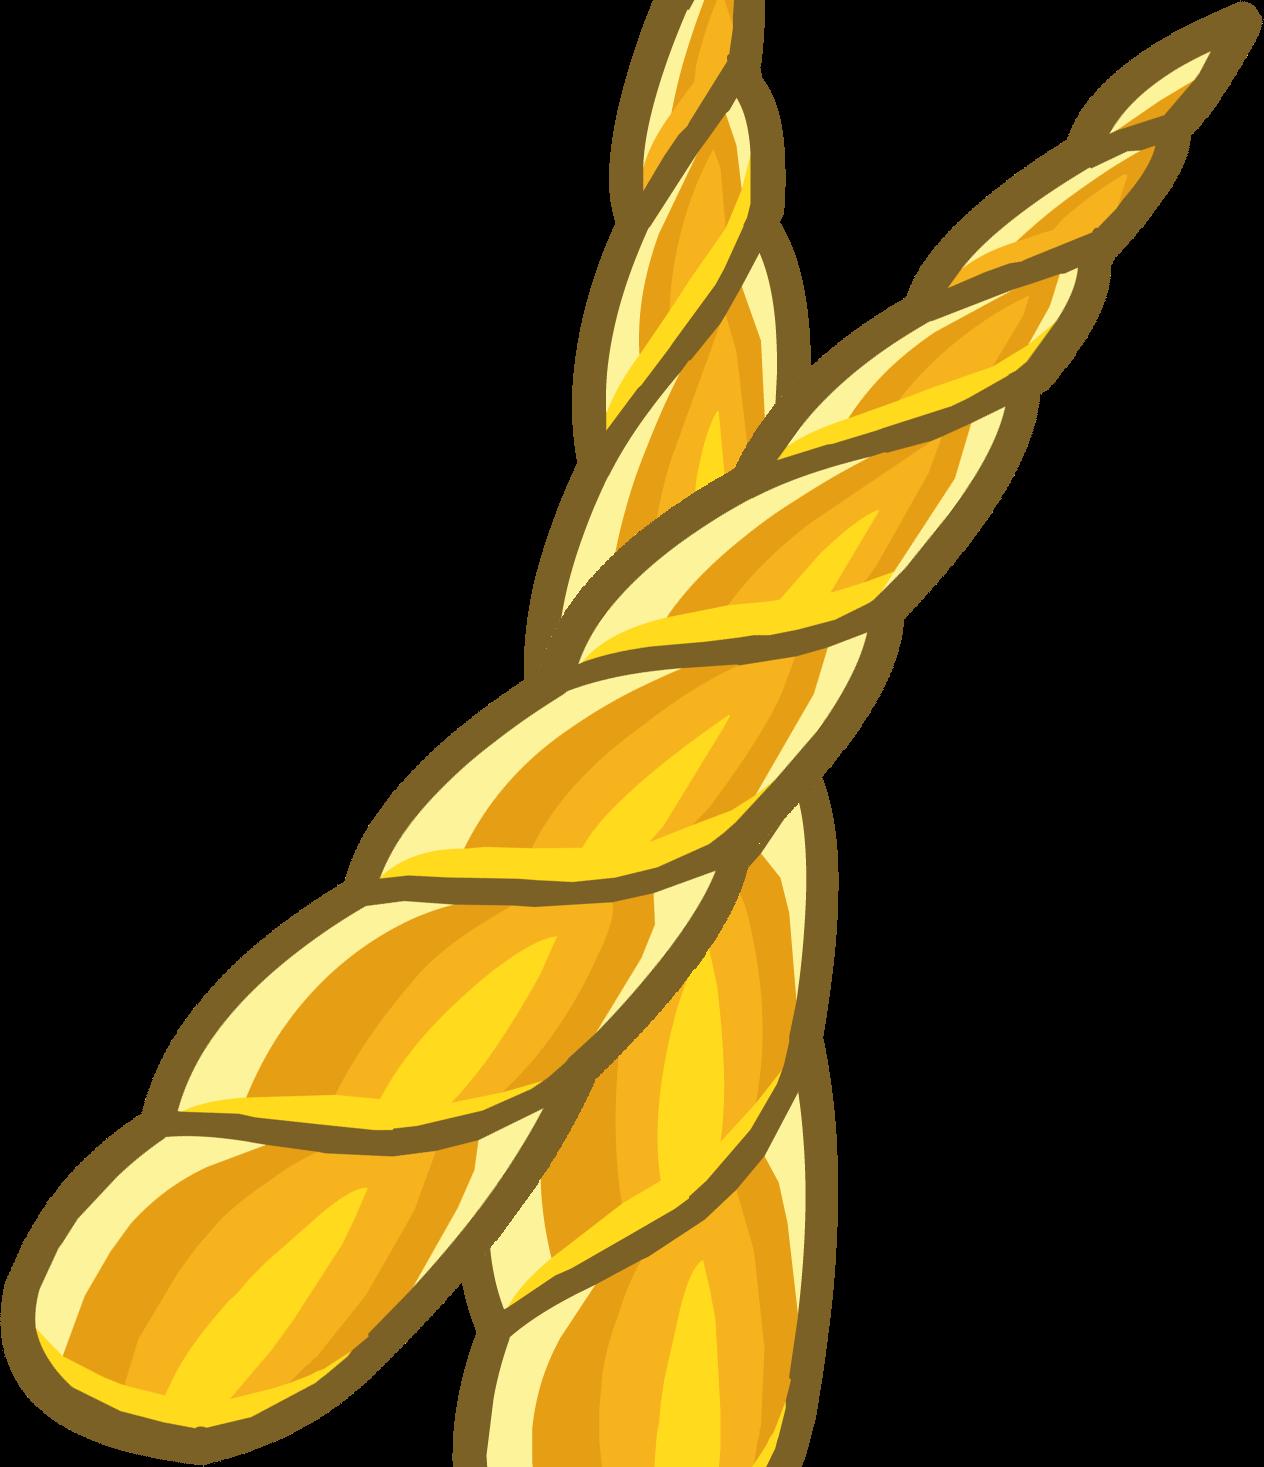 Golden Unicorn Horn | Club Penguin Wiki | FANDOM powered ...